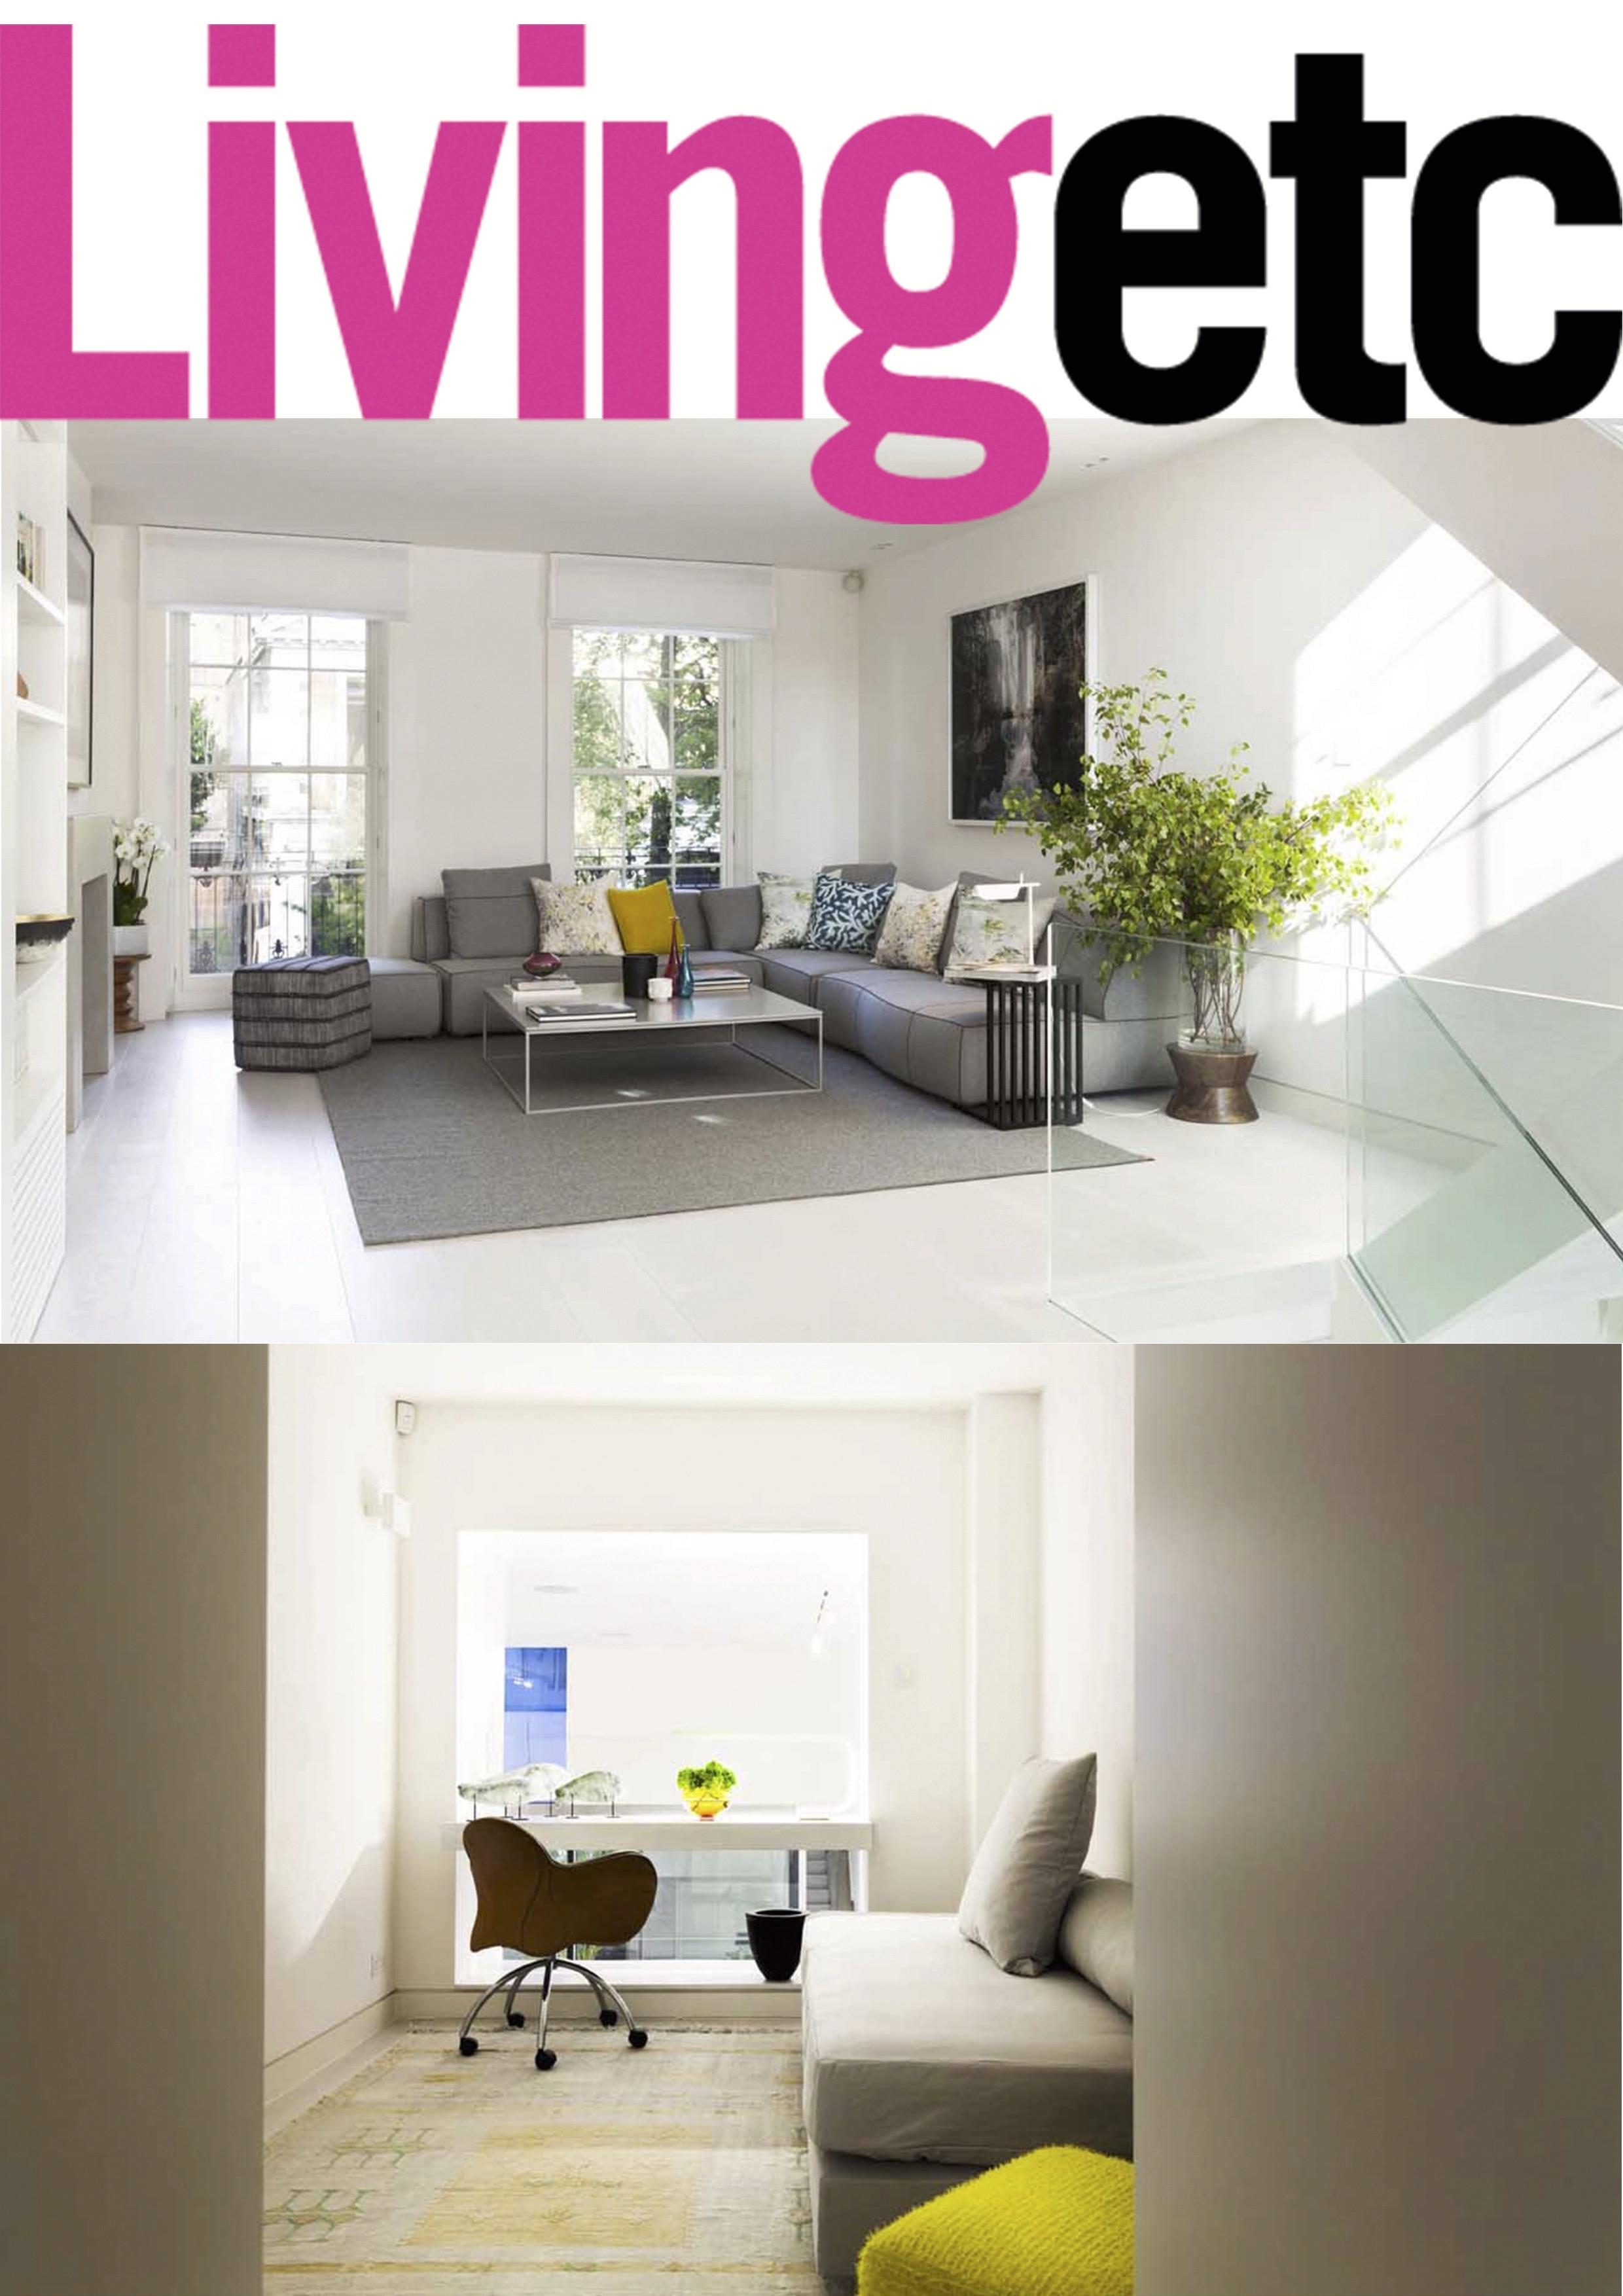 Living Etc board.jpg